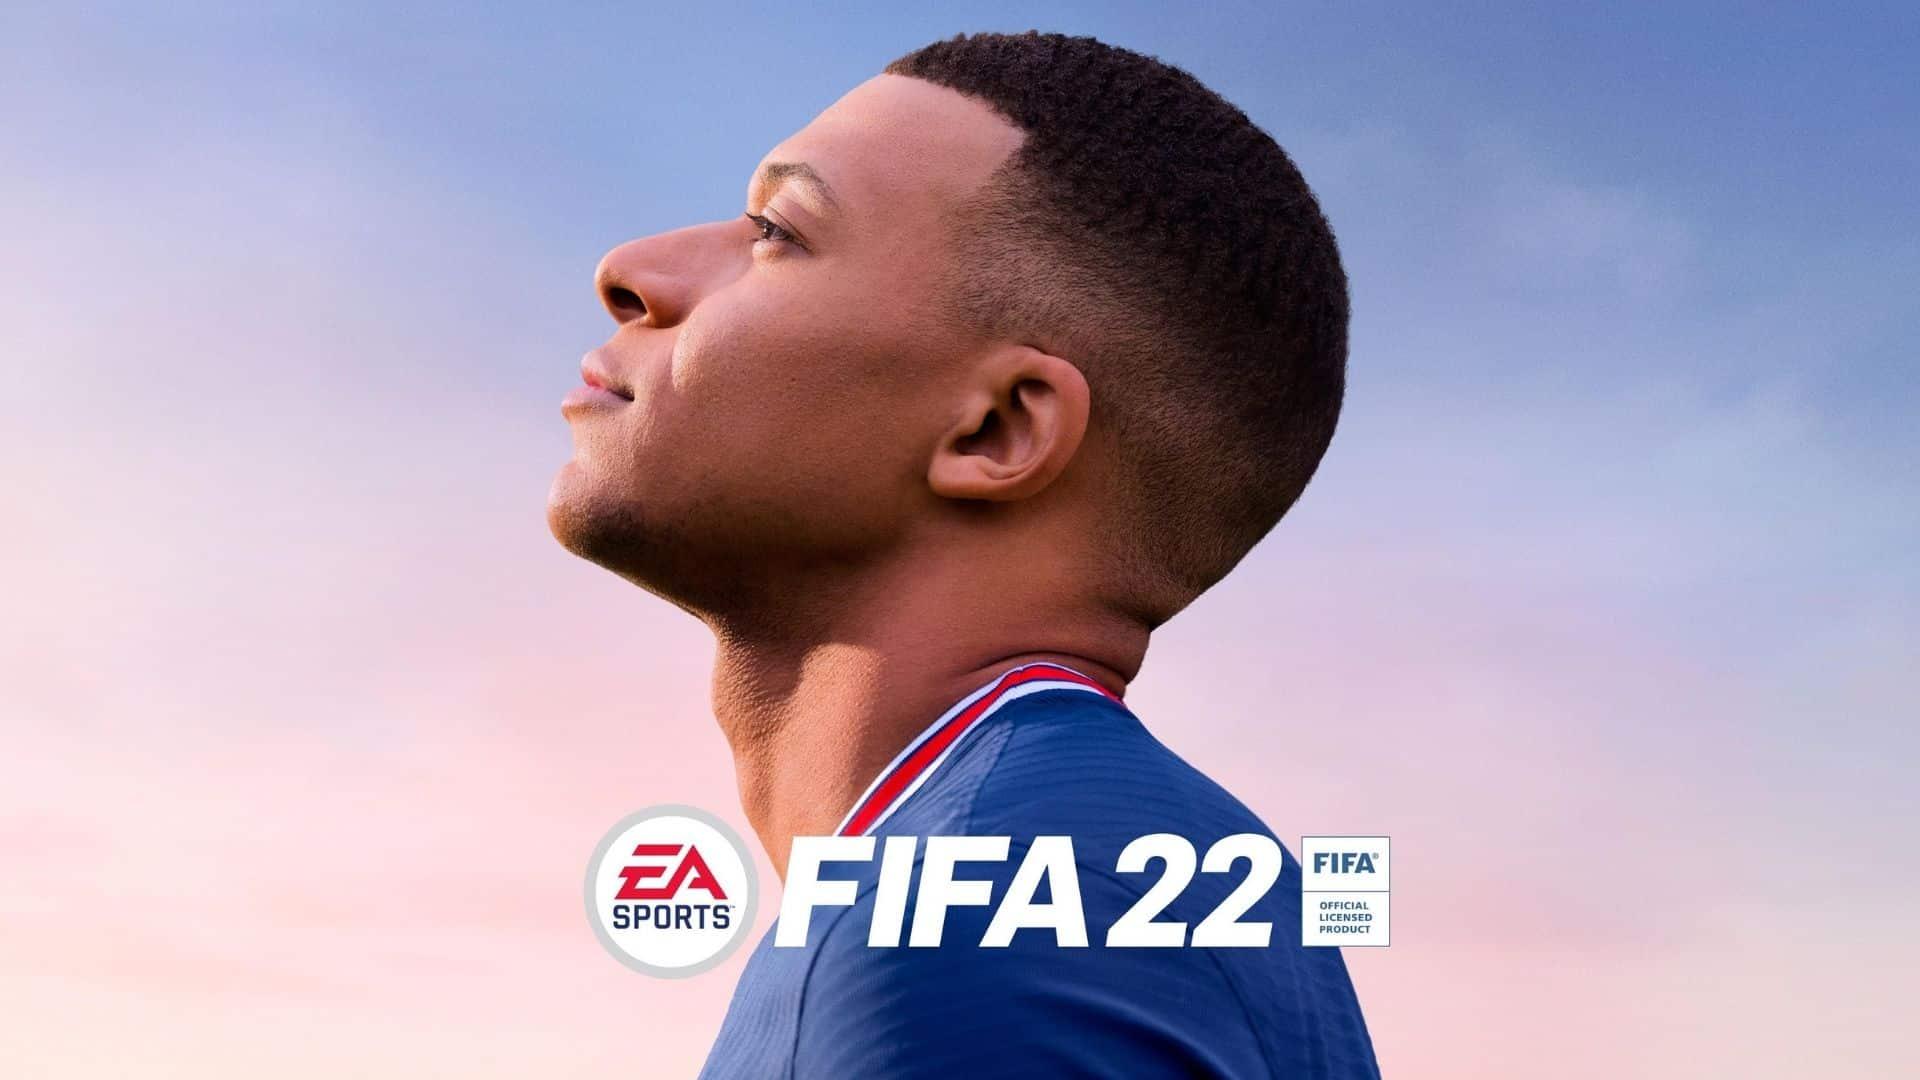 3DM速报:《NBA 2K22》正式公布 《FIFA 22》Steam国区被退款